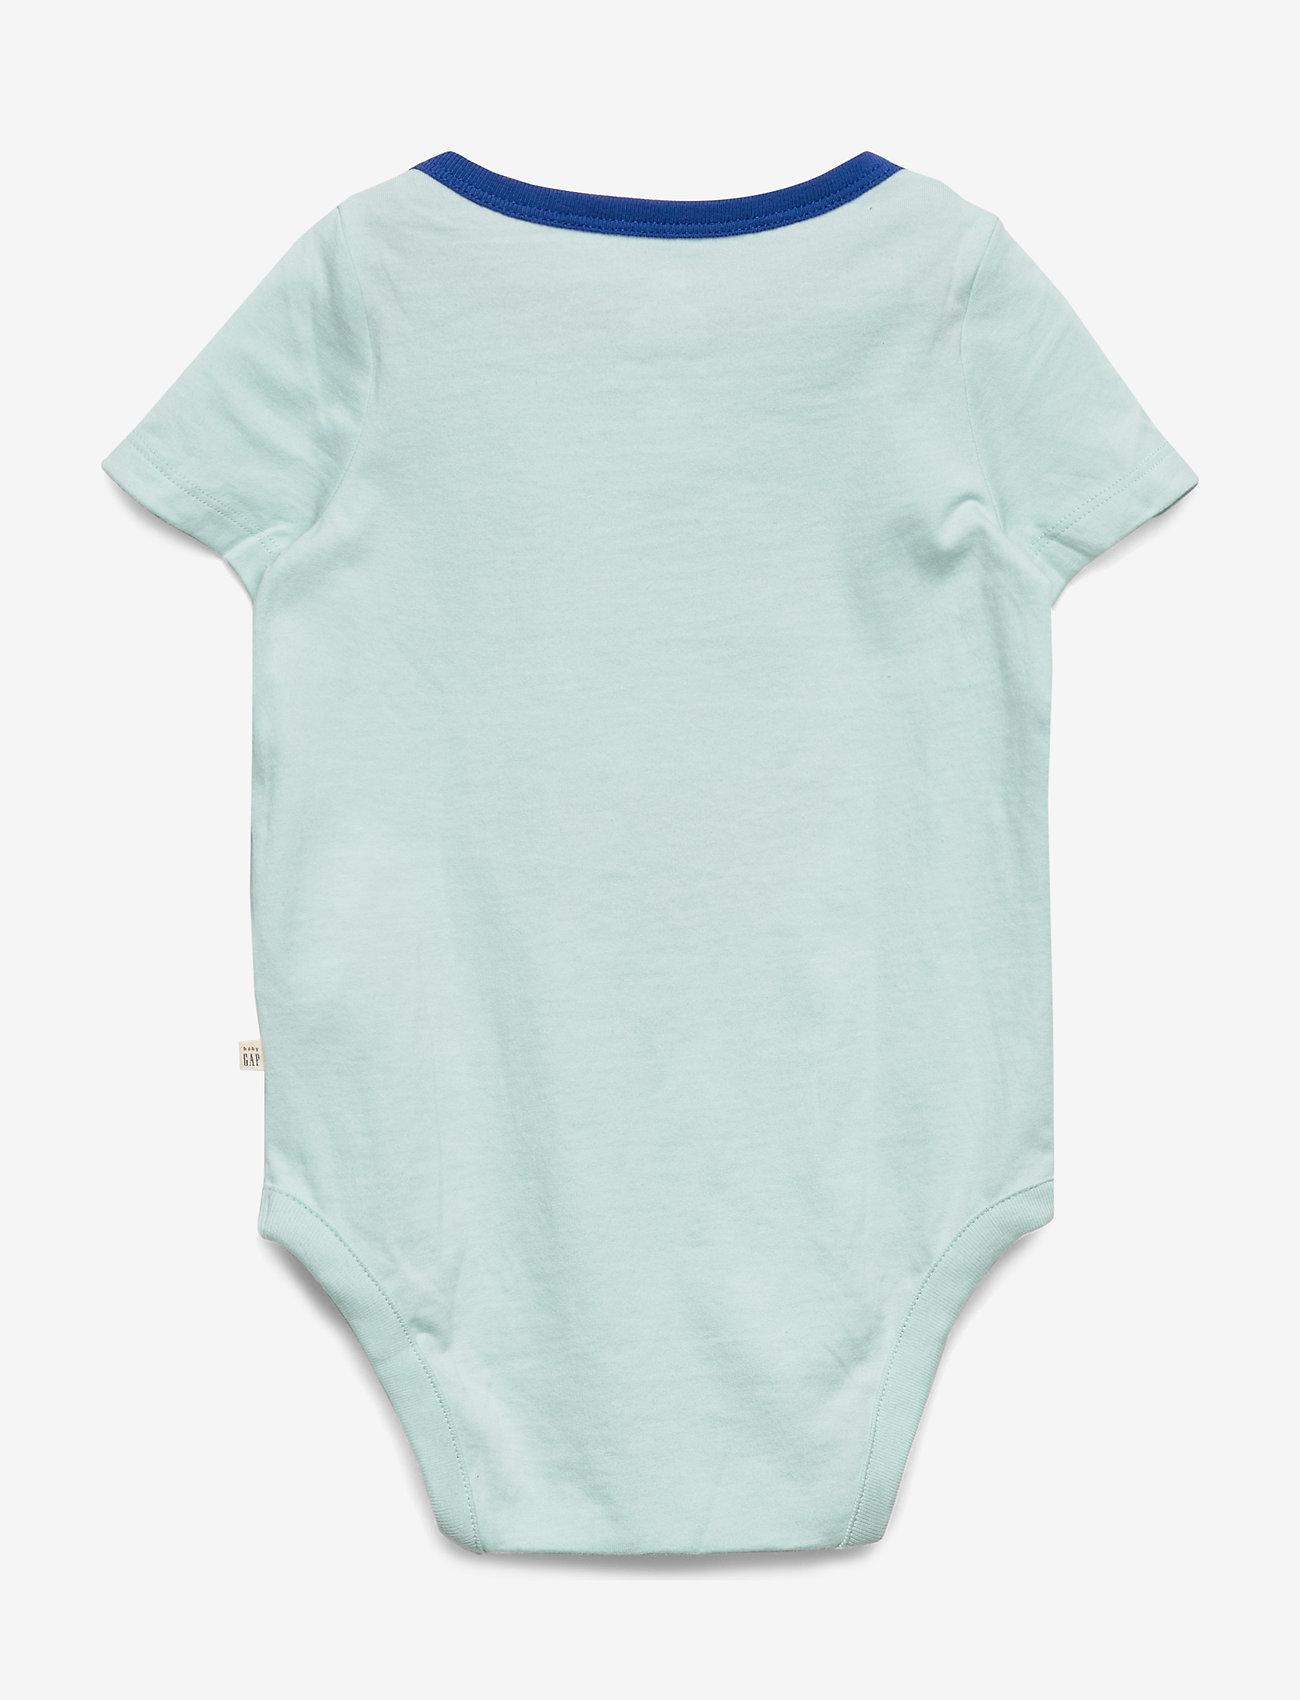 Baby Mix And Match Family Bodysuit (Azul) (9 €) - GAP v99xK